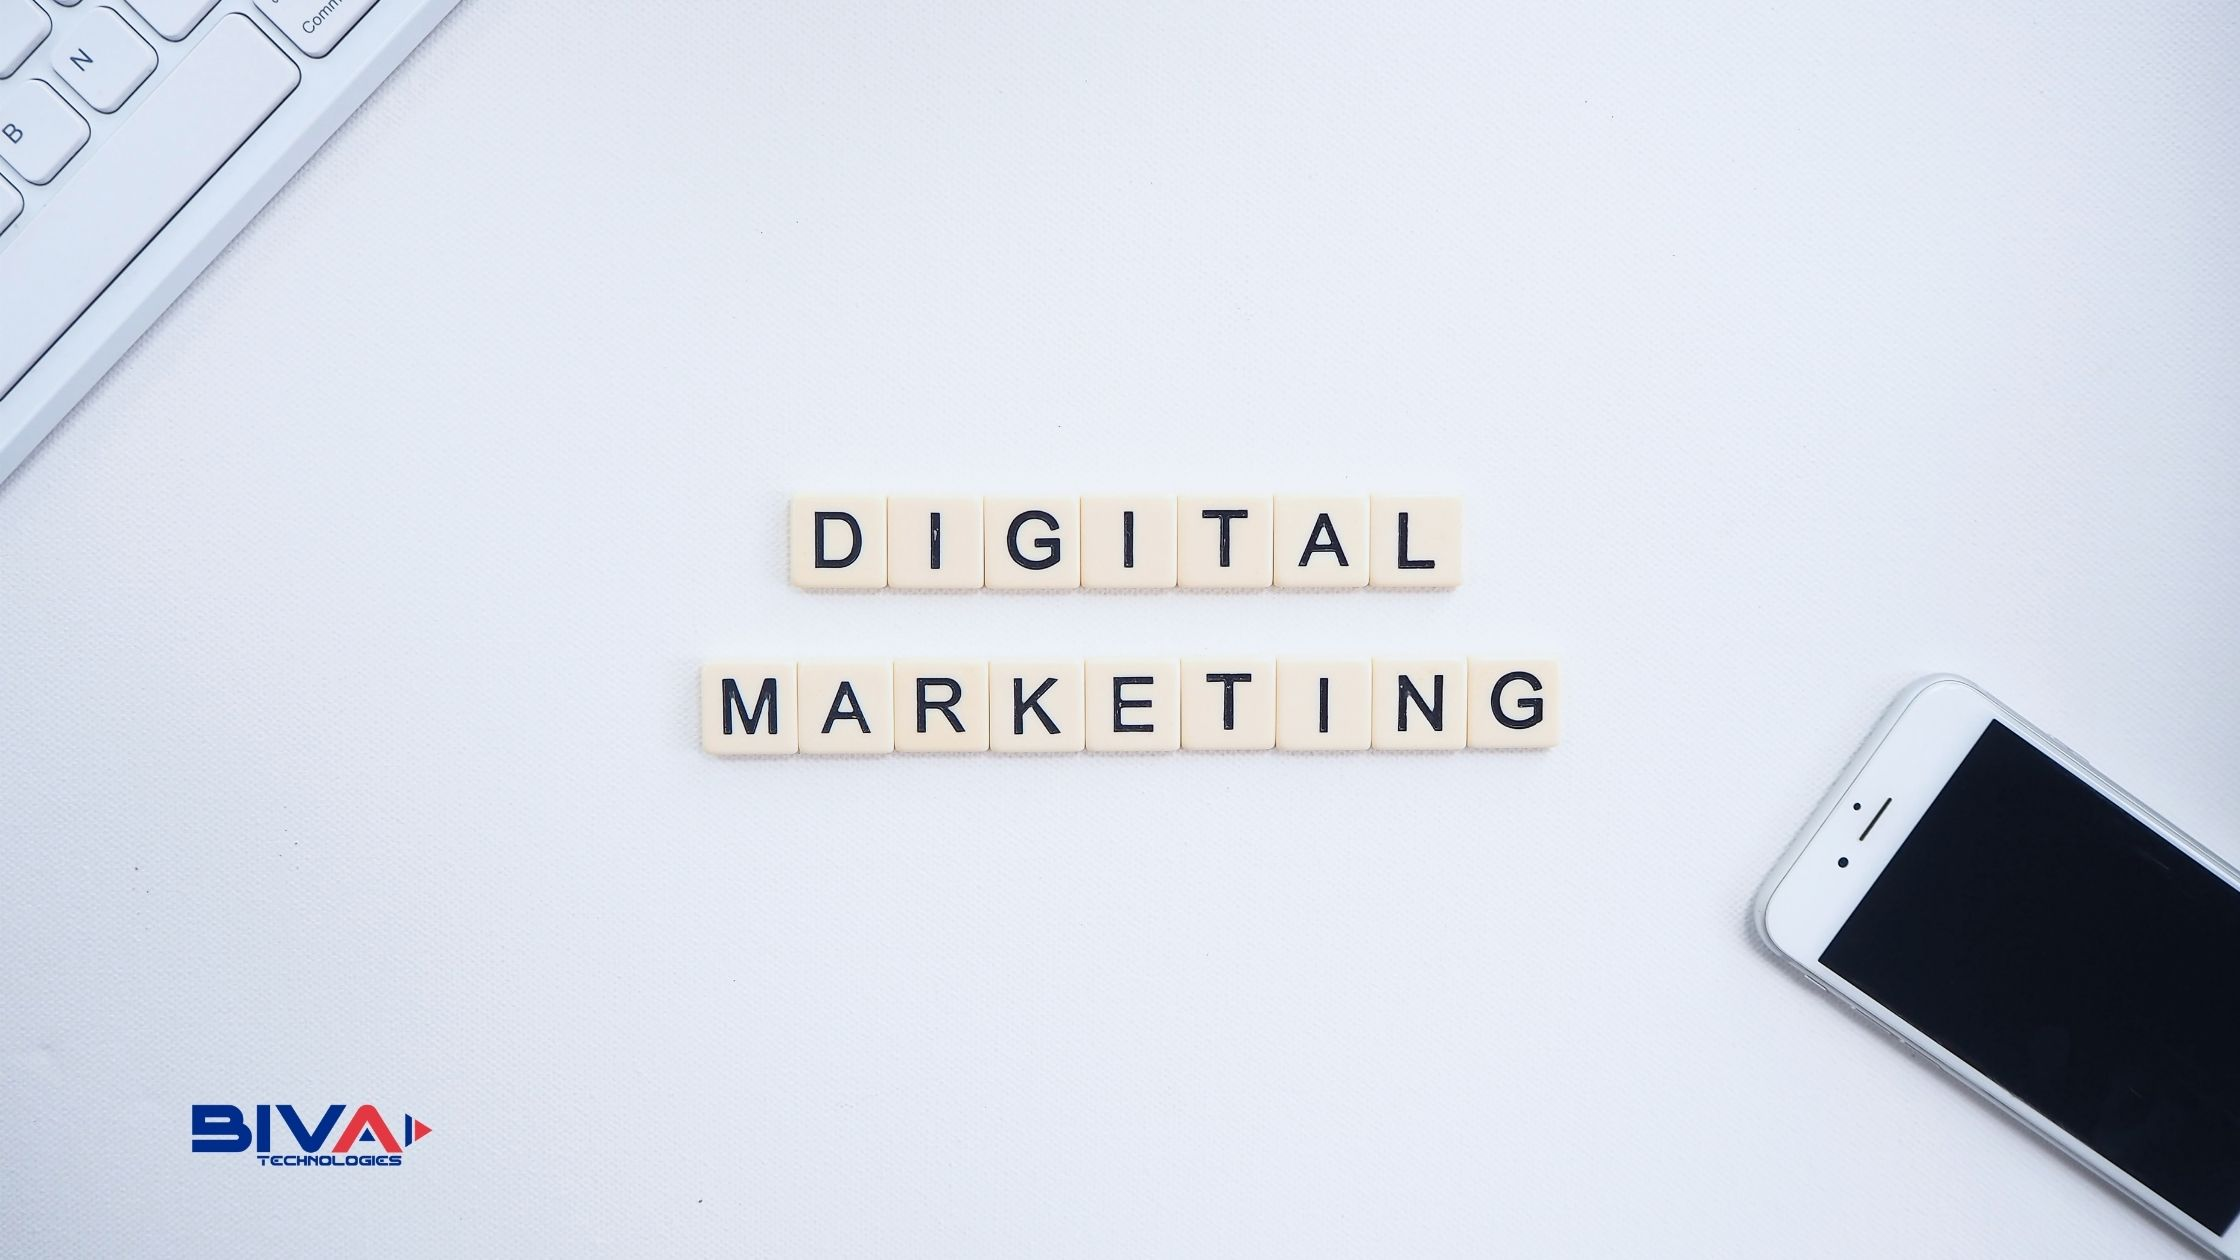 Top 9 Digital Marketing Tips for Online Business